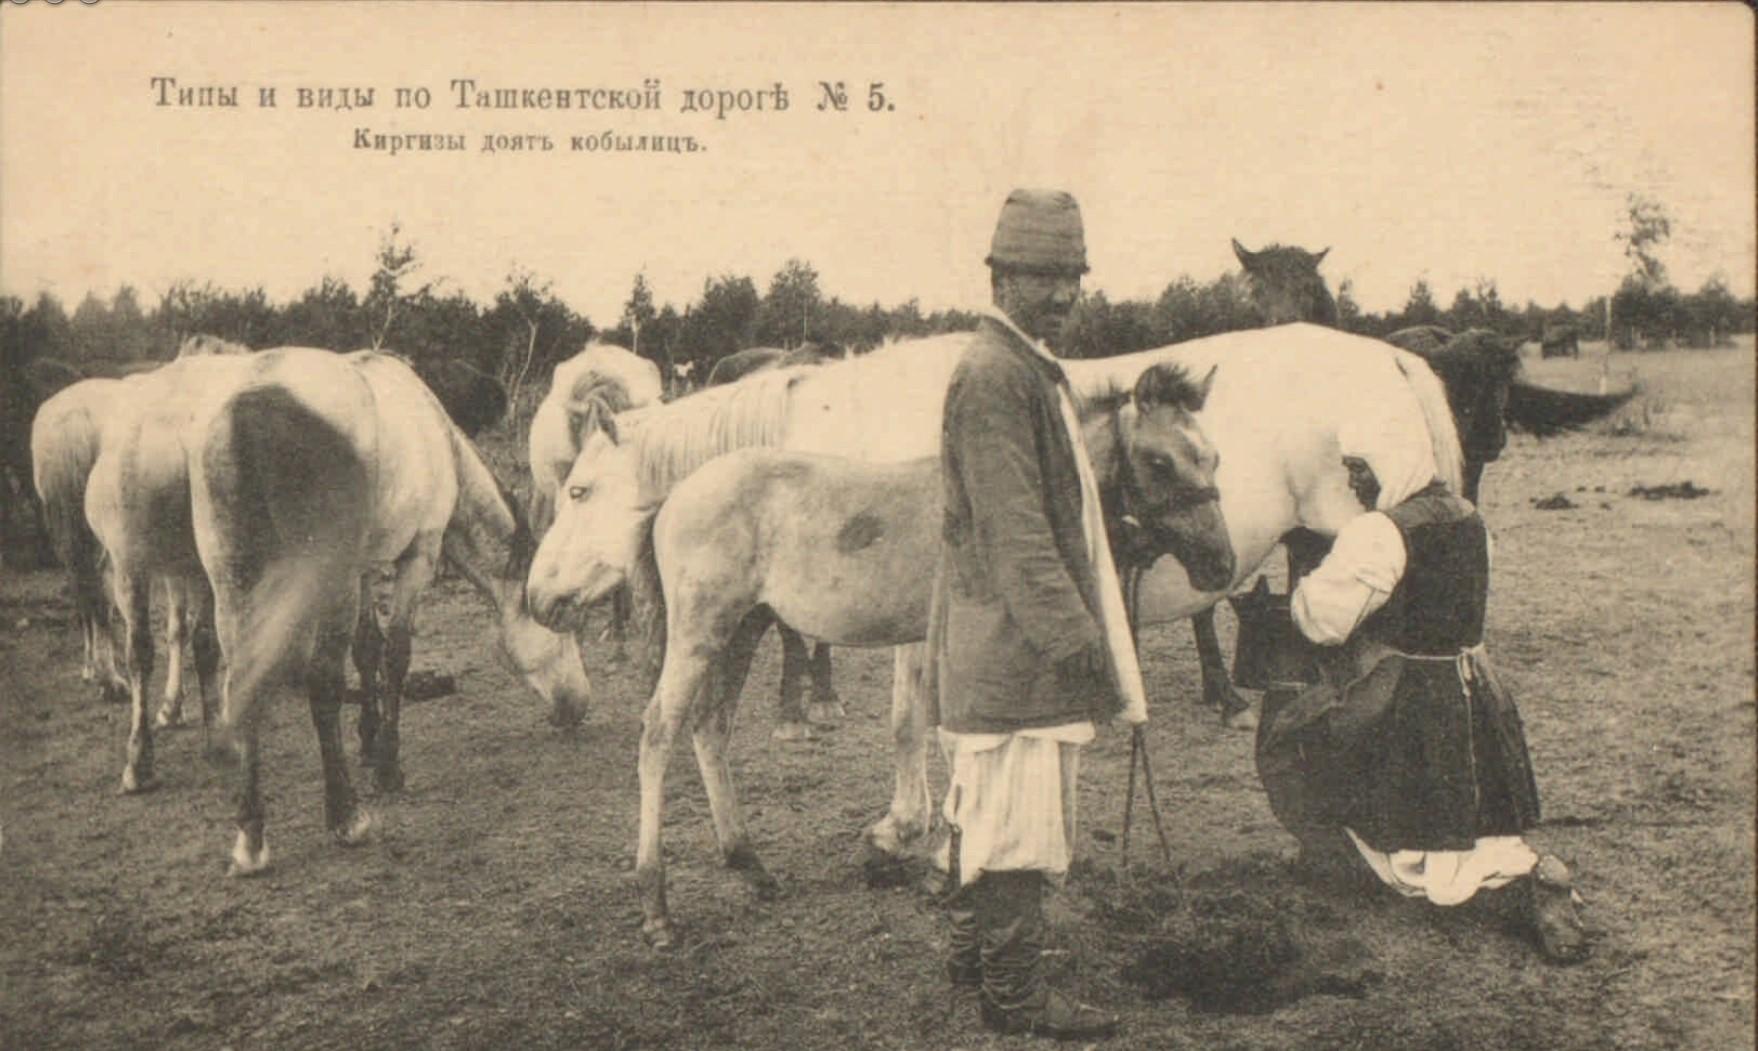 Окрестности Ташкента. Киргизы доят кобылиц